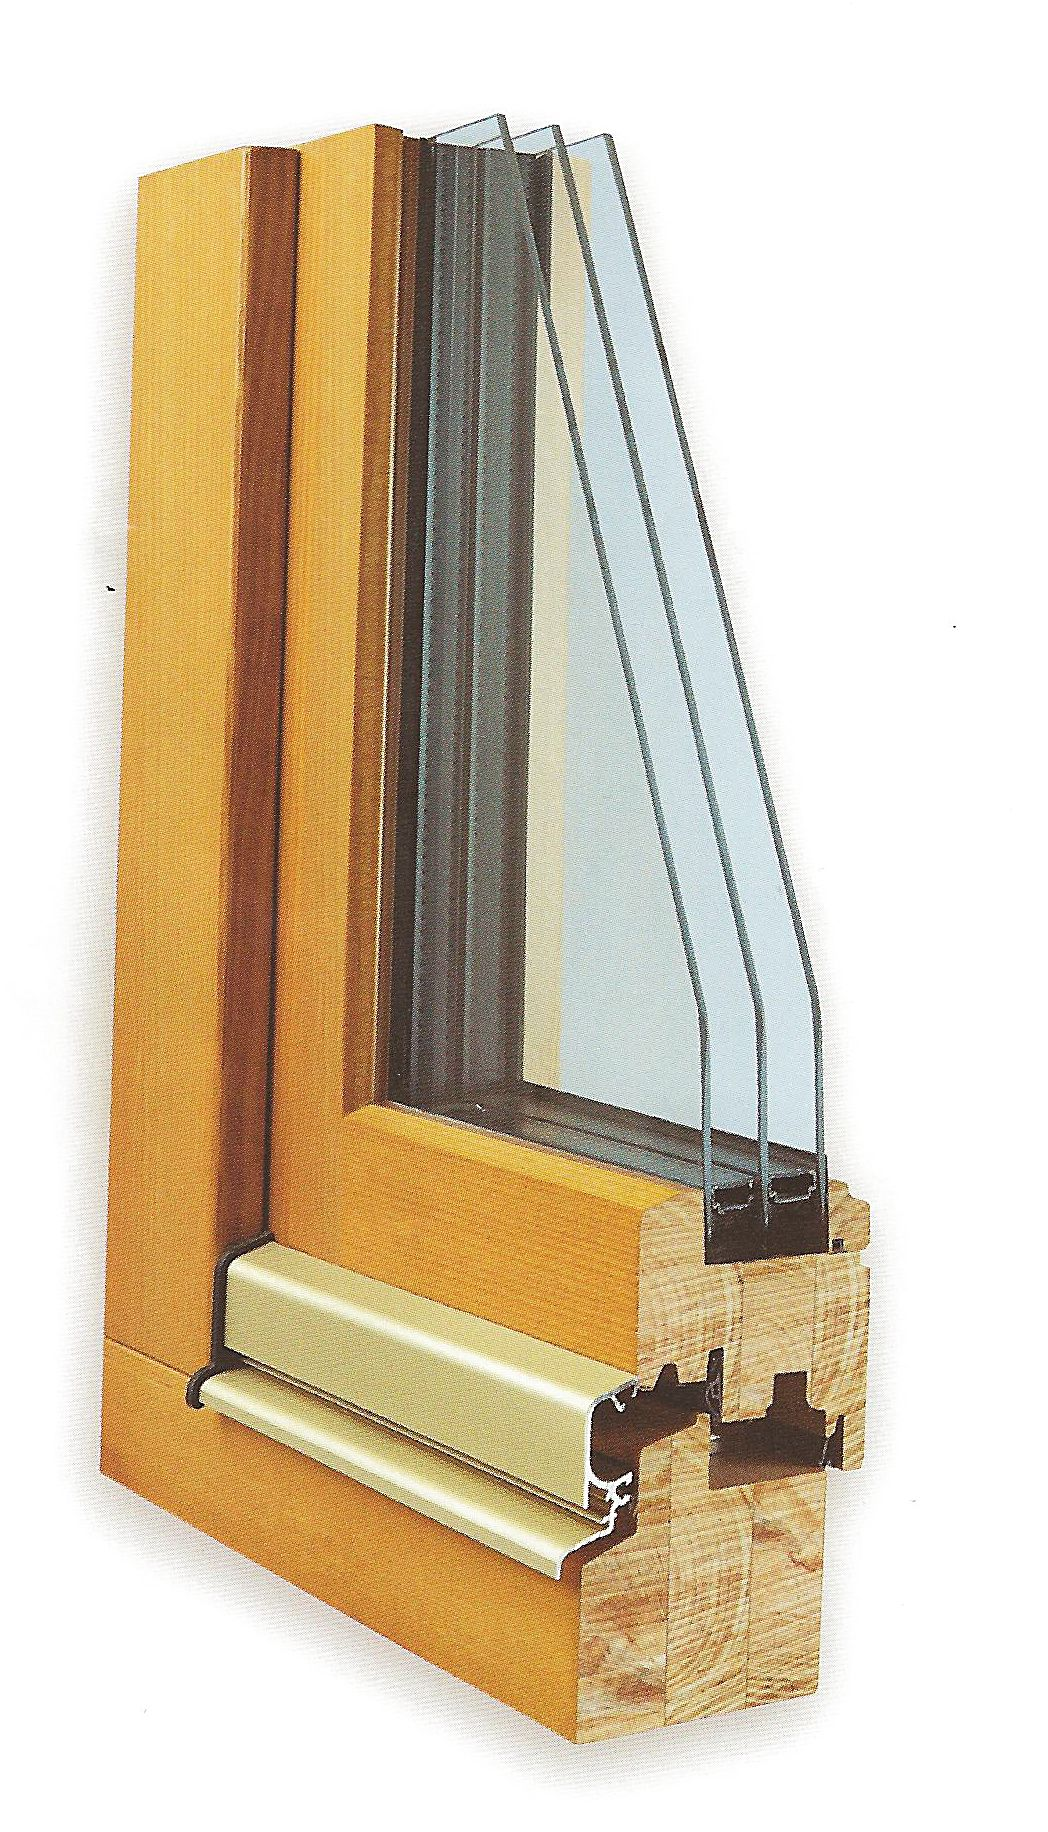 isolation phonique fenetre bois isolation phonique. Black Bedroom Furniture Sets. Home Design Ideas